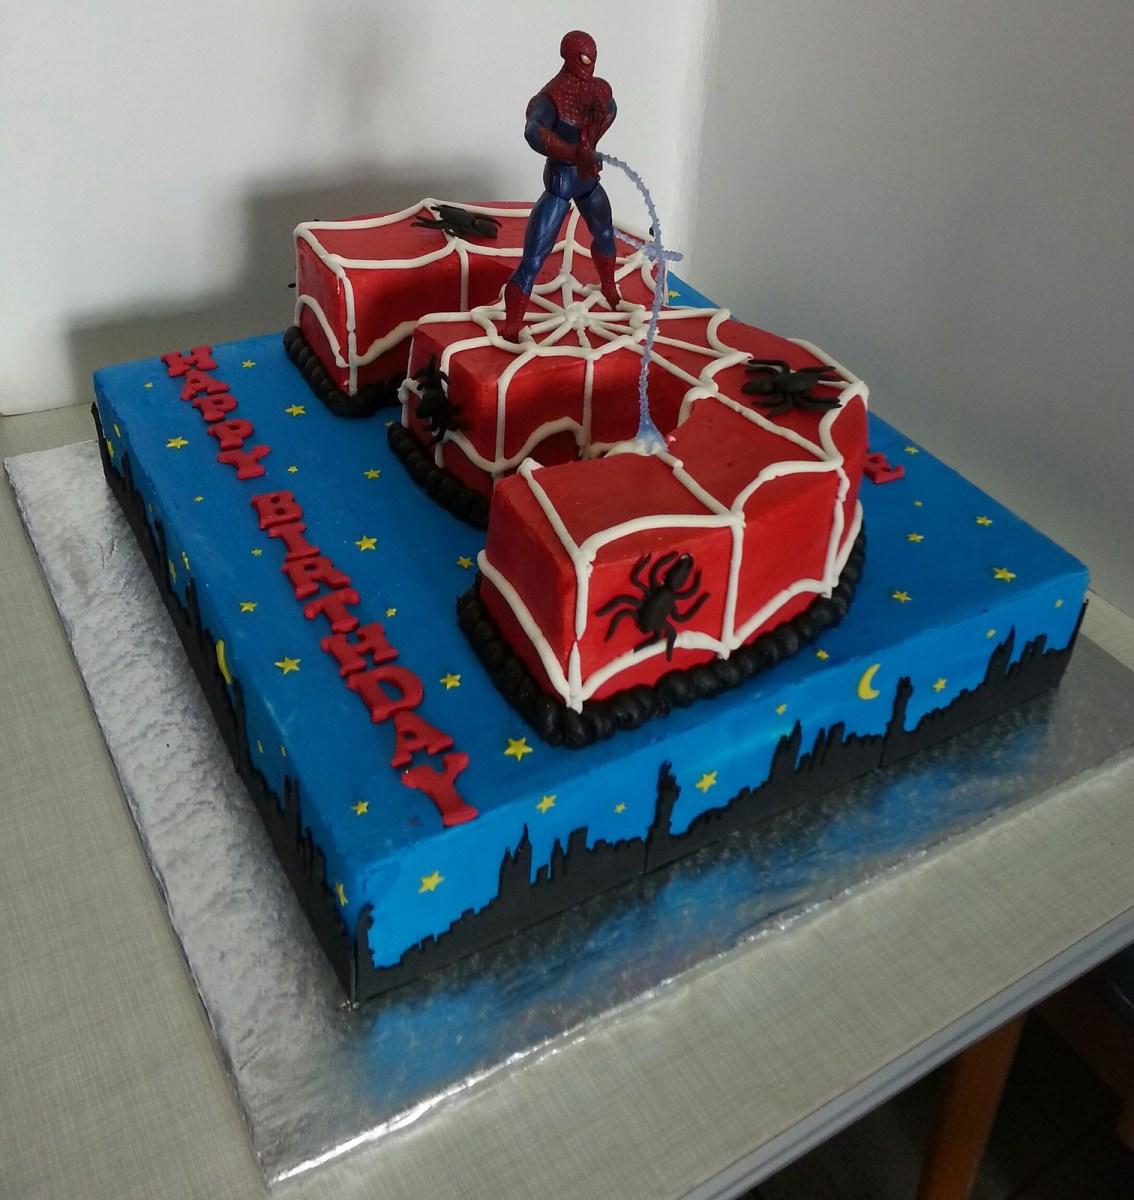 Spiderman Birthday Cakes Spiderman Birthday Cake Cakes Cupcakes Pinterest Birthday